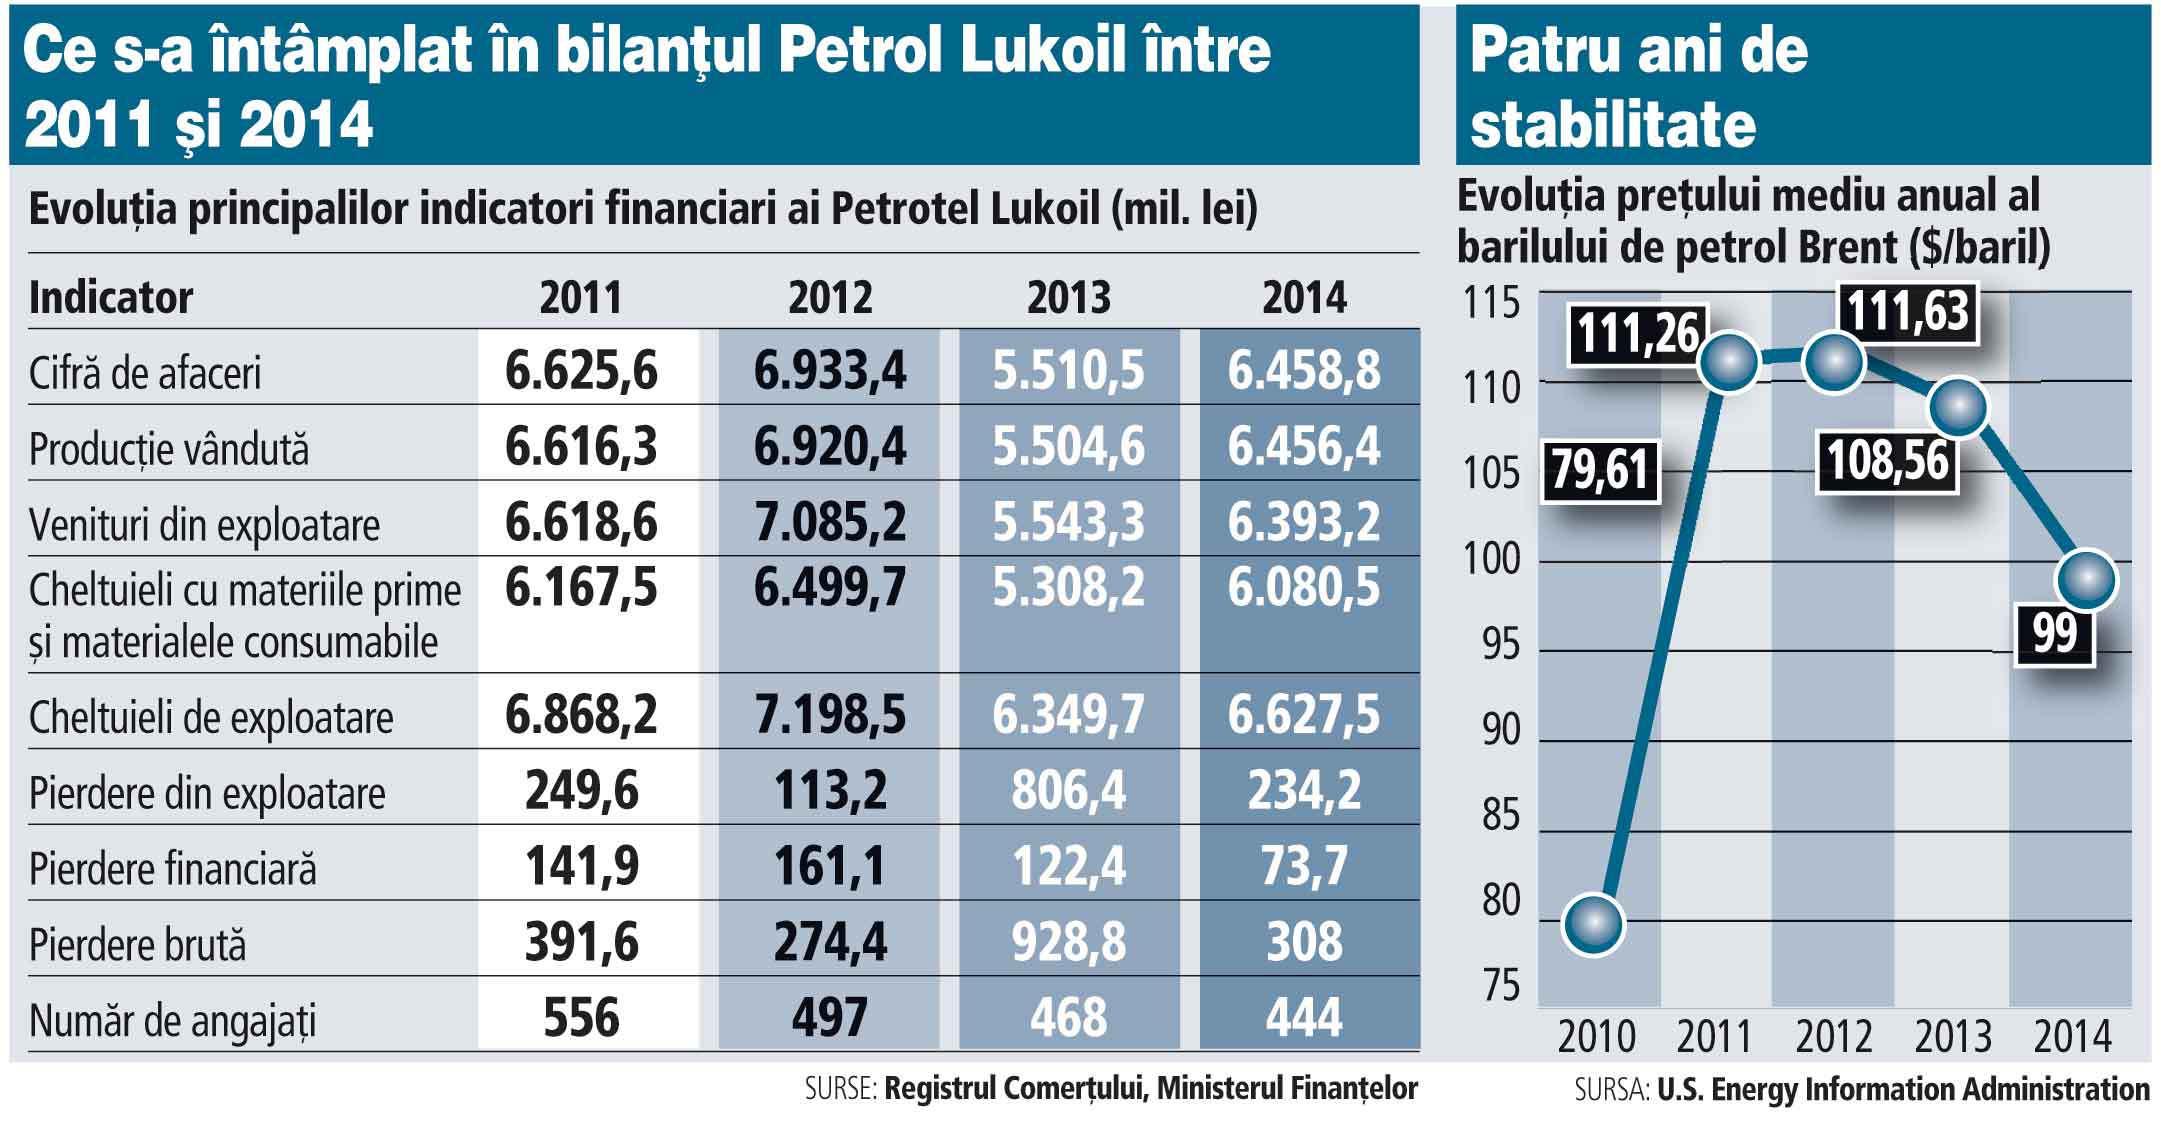 Evoluţia principalilor indicatori financiari ai Petrotel Lukoil (2011-2014)